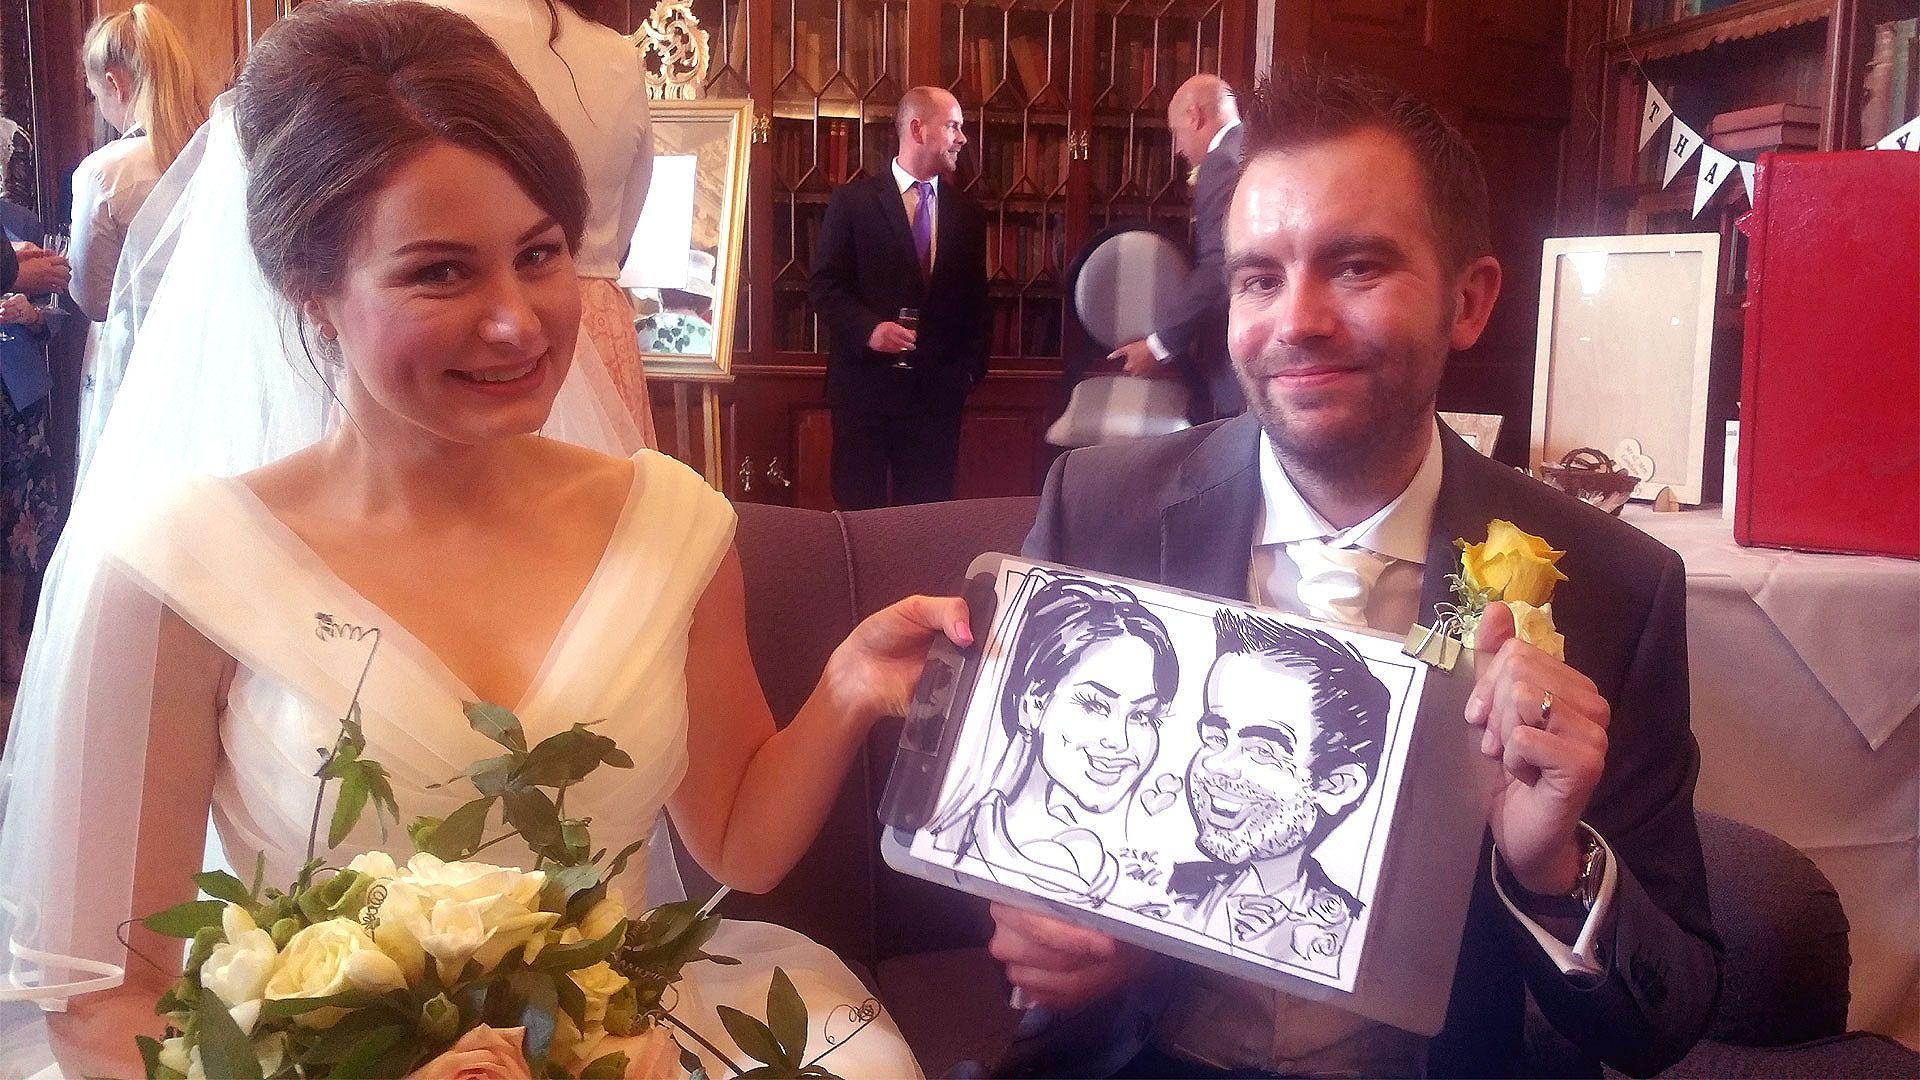 Wedding caricature of the bride & groom.